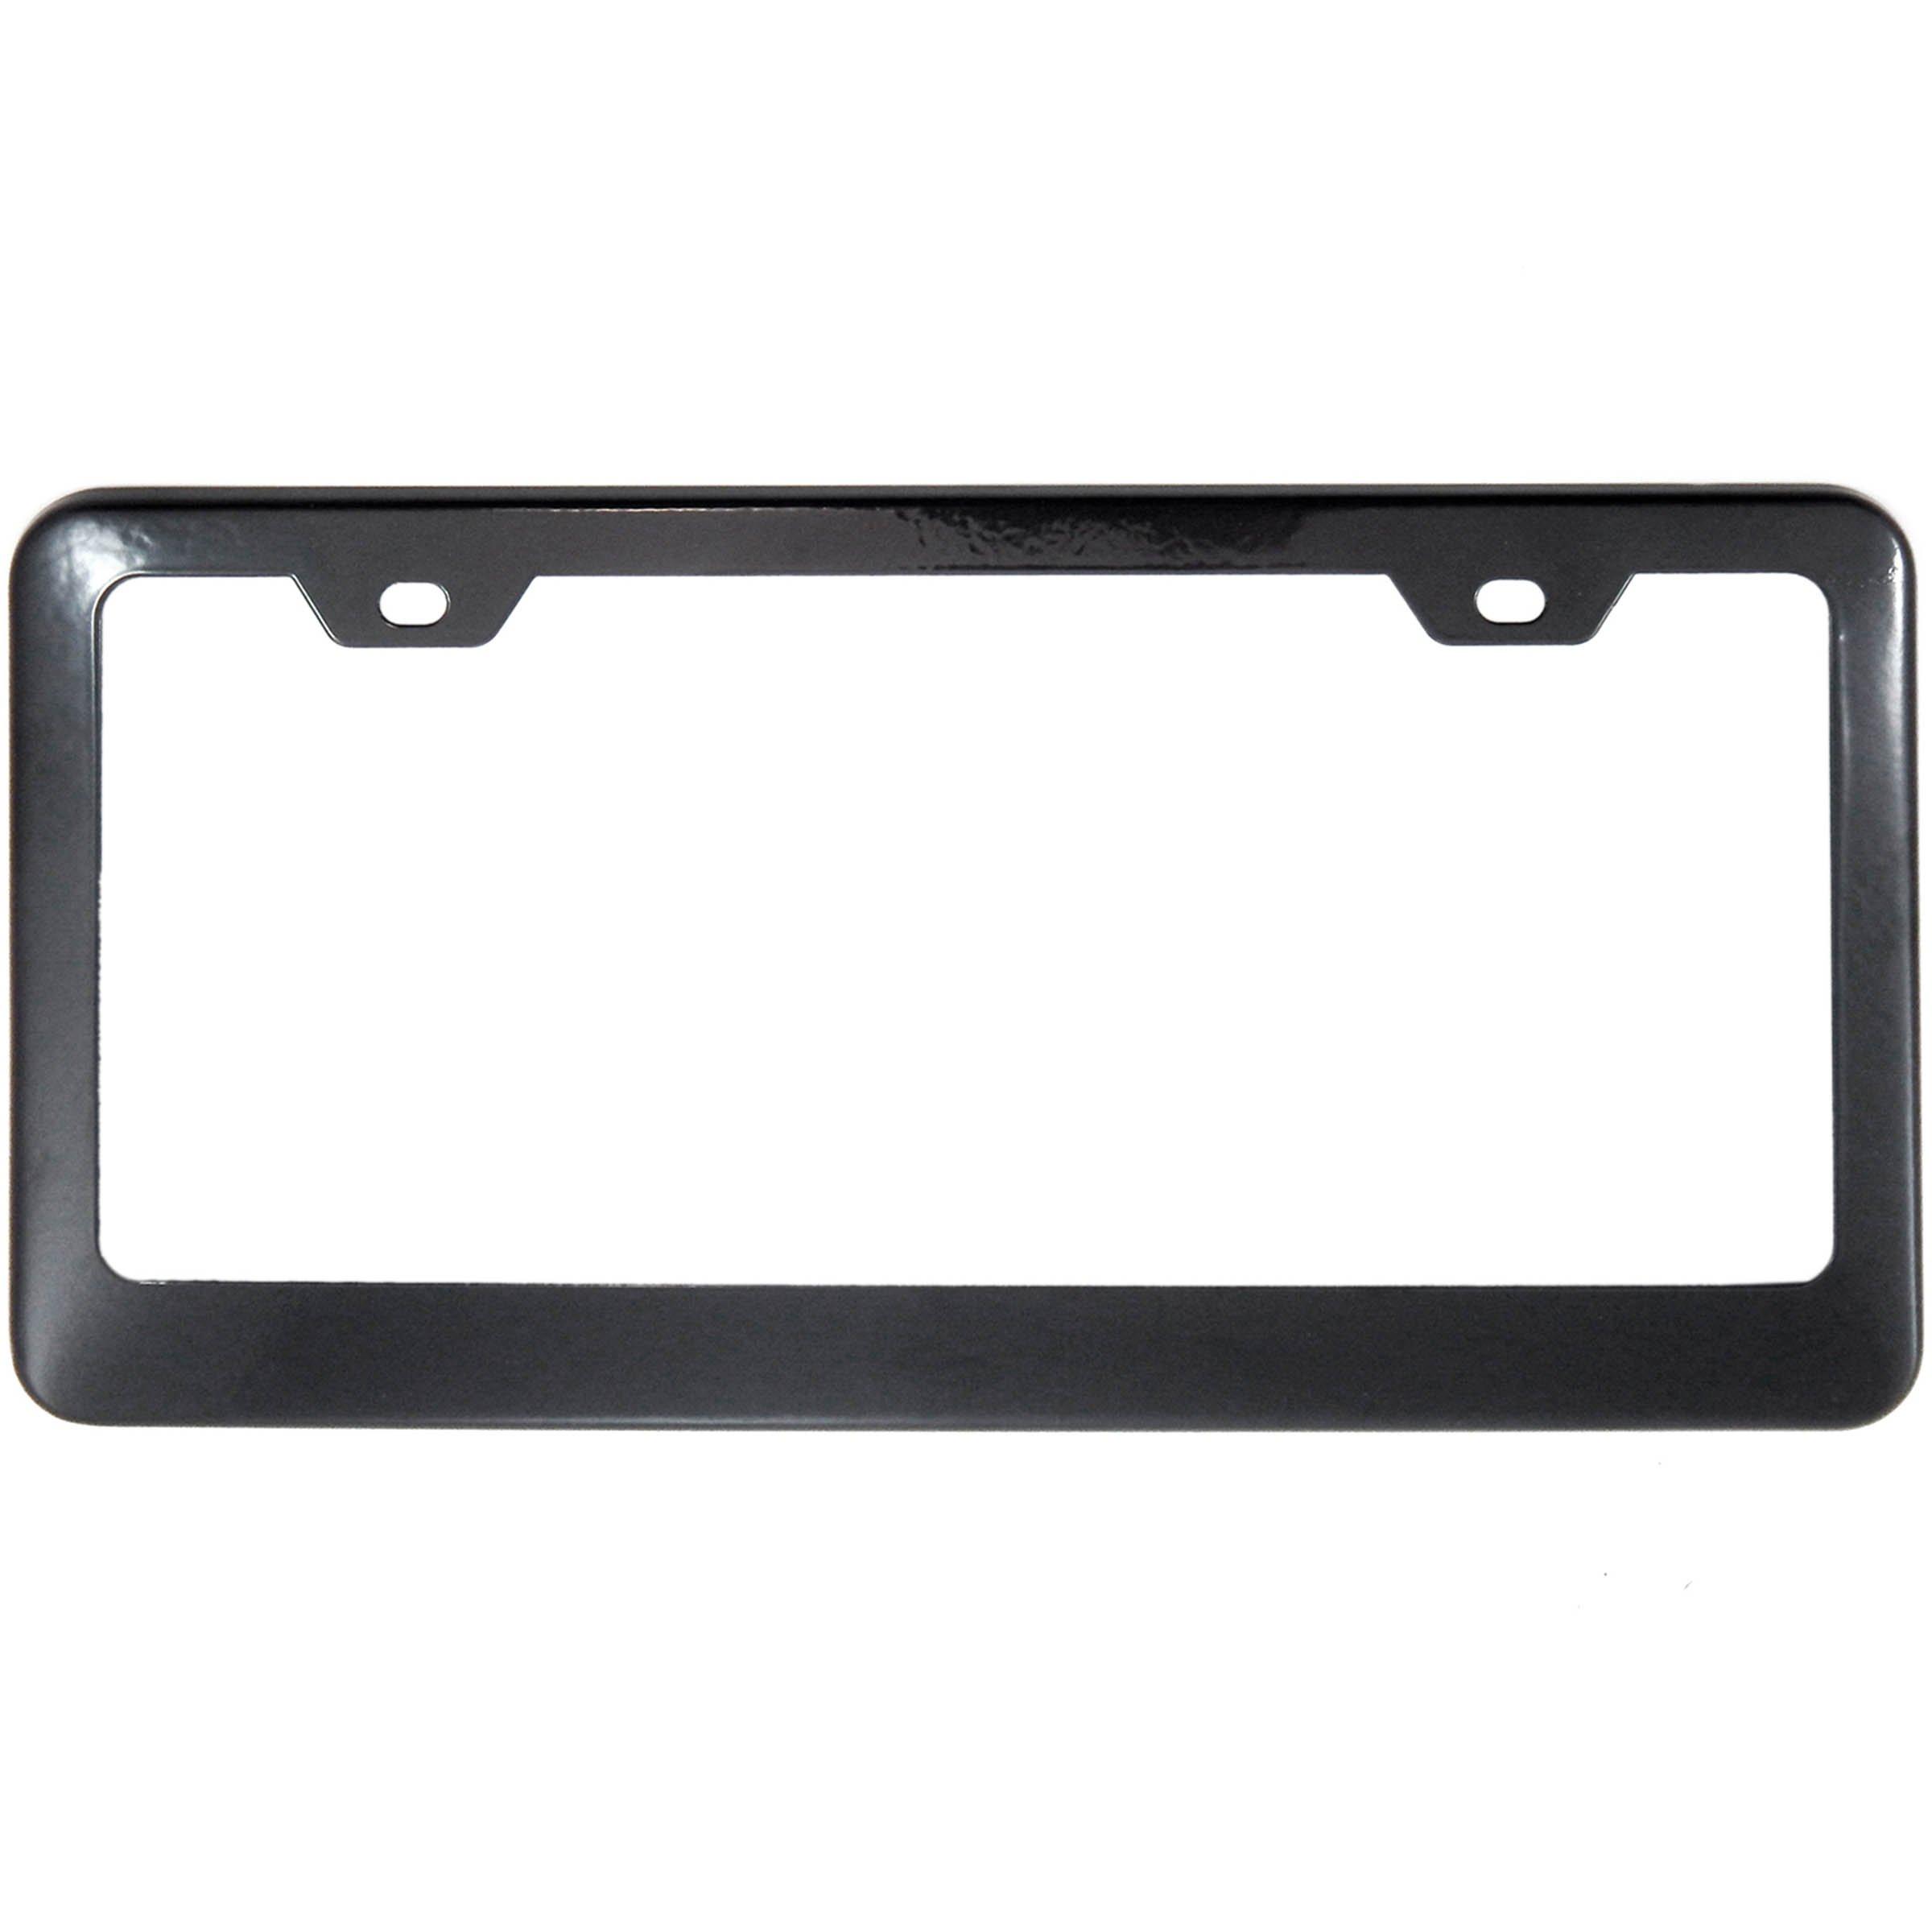 Black Stainless Steel License Plate Frame Tag Holder - Premium Quality